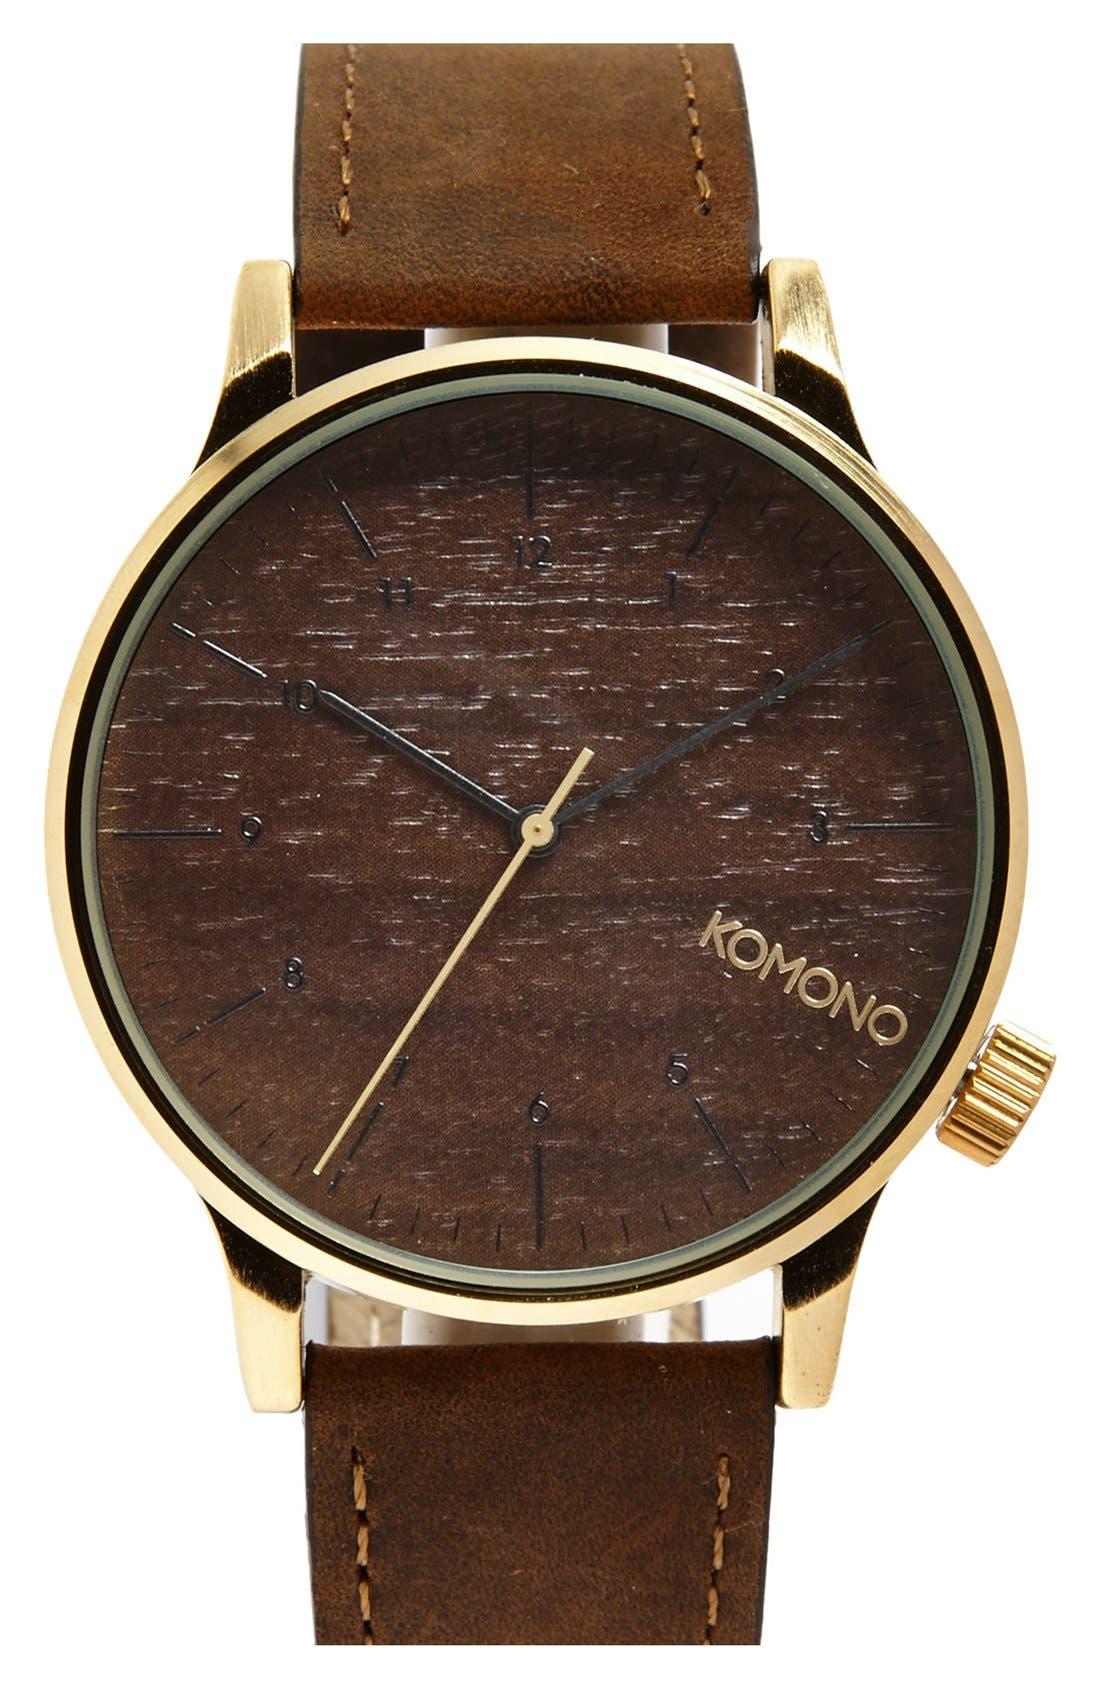 Main Image - Komono 'Winston' Round Leather Strap Watch, 41mm